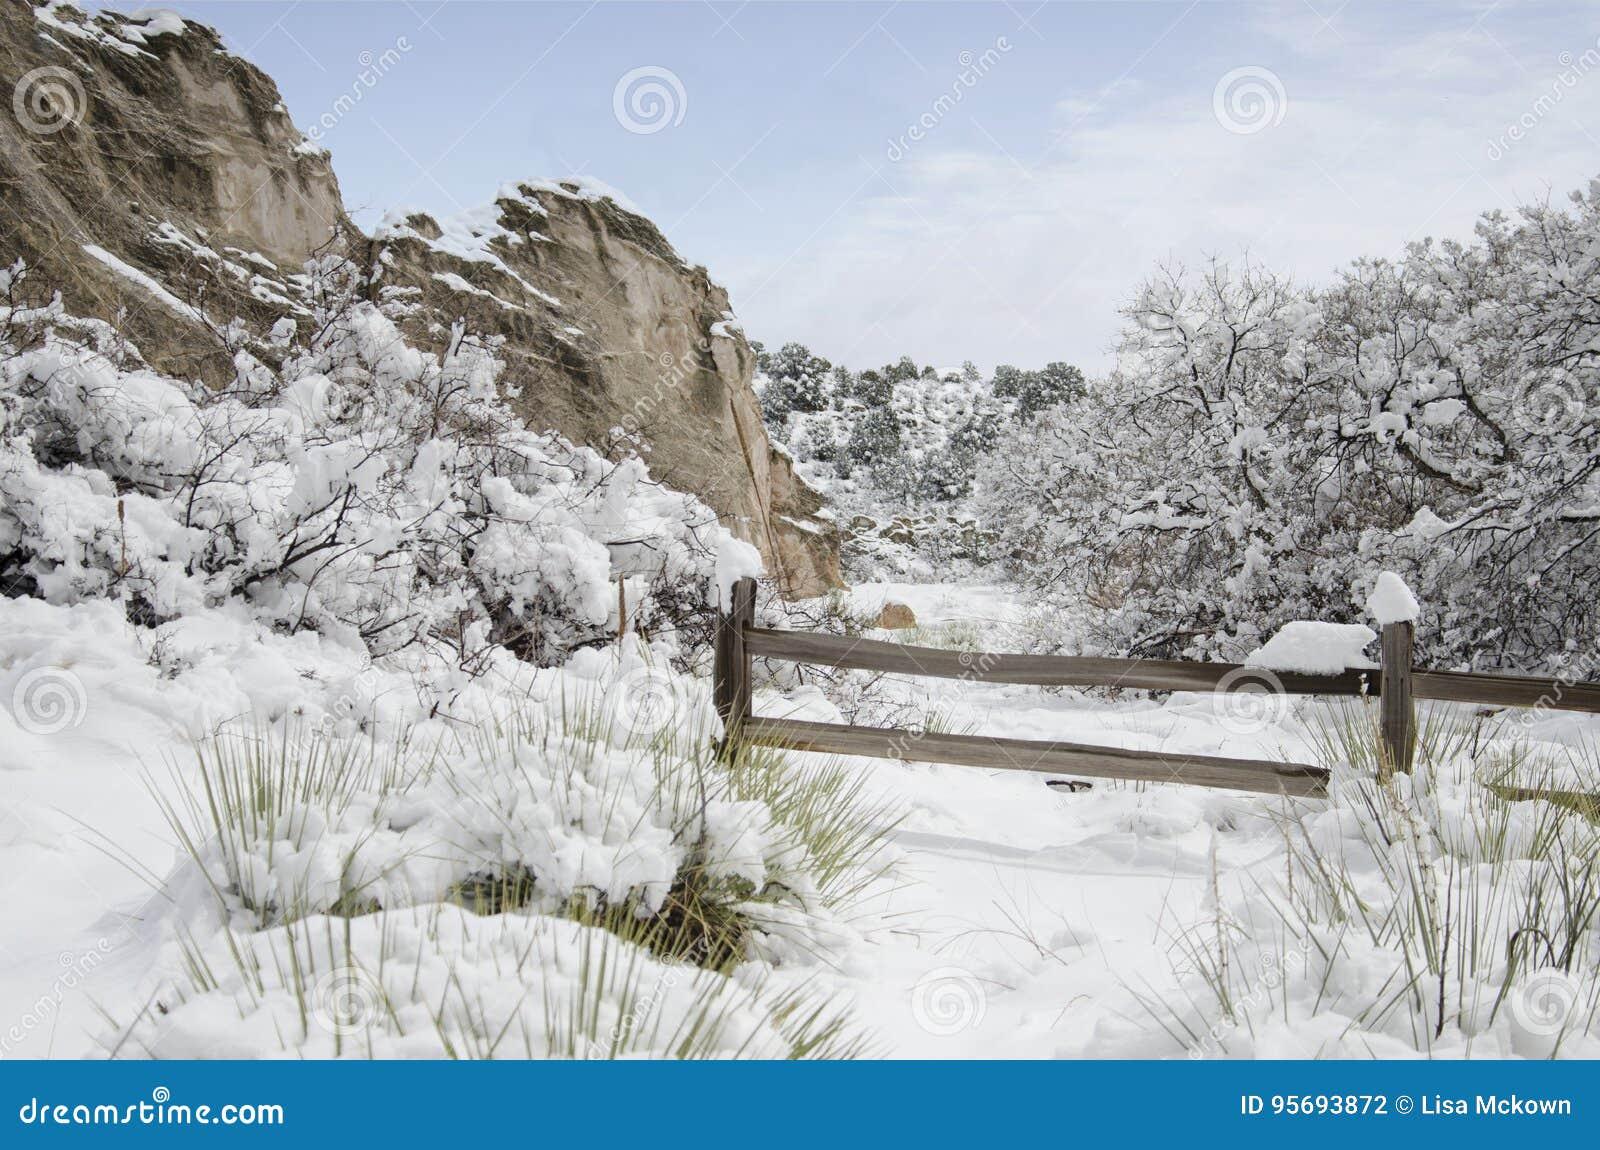 Garden of the Gods Park in Winter